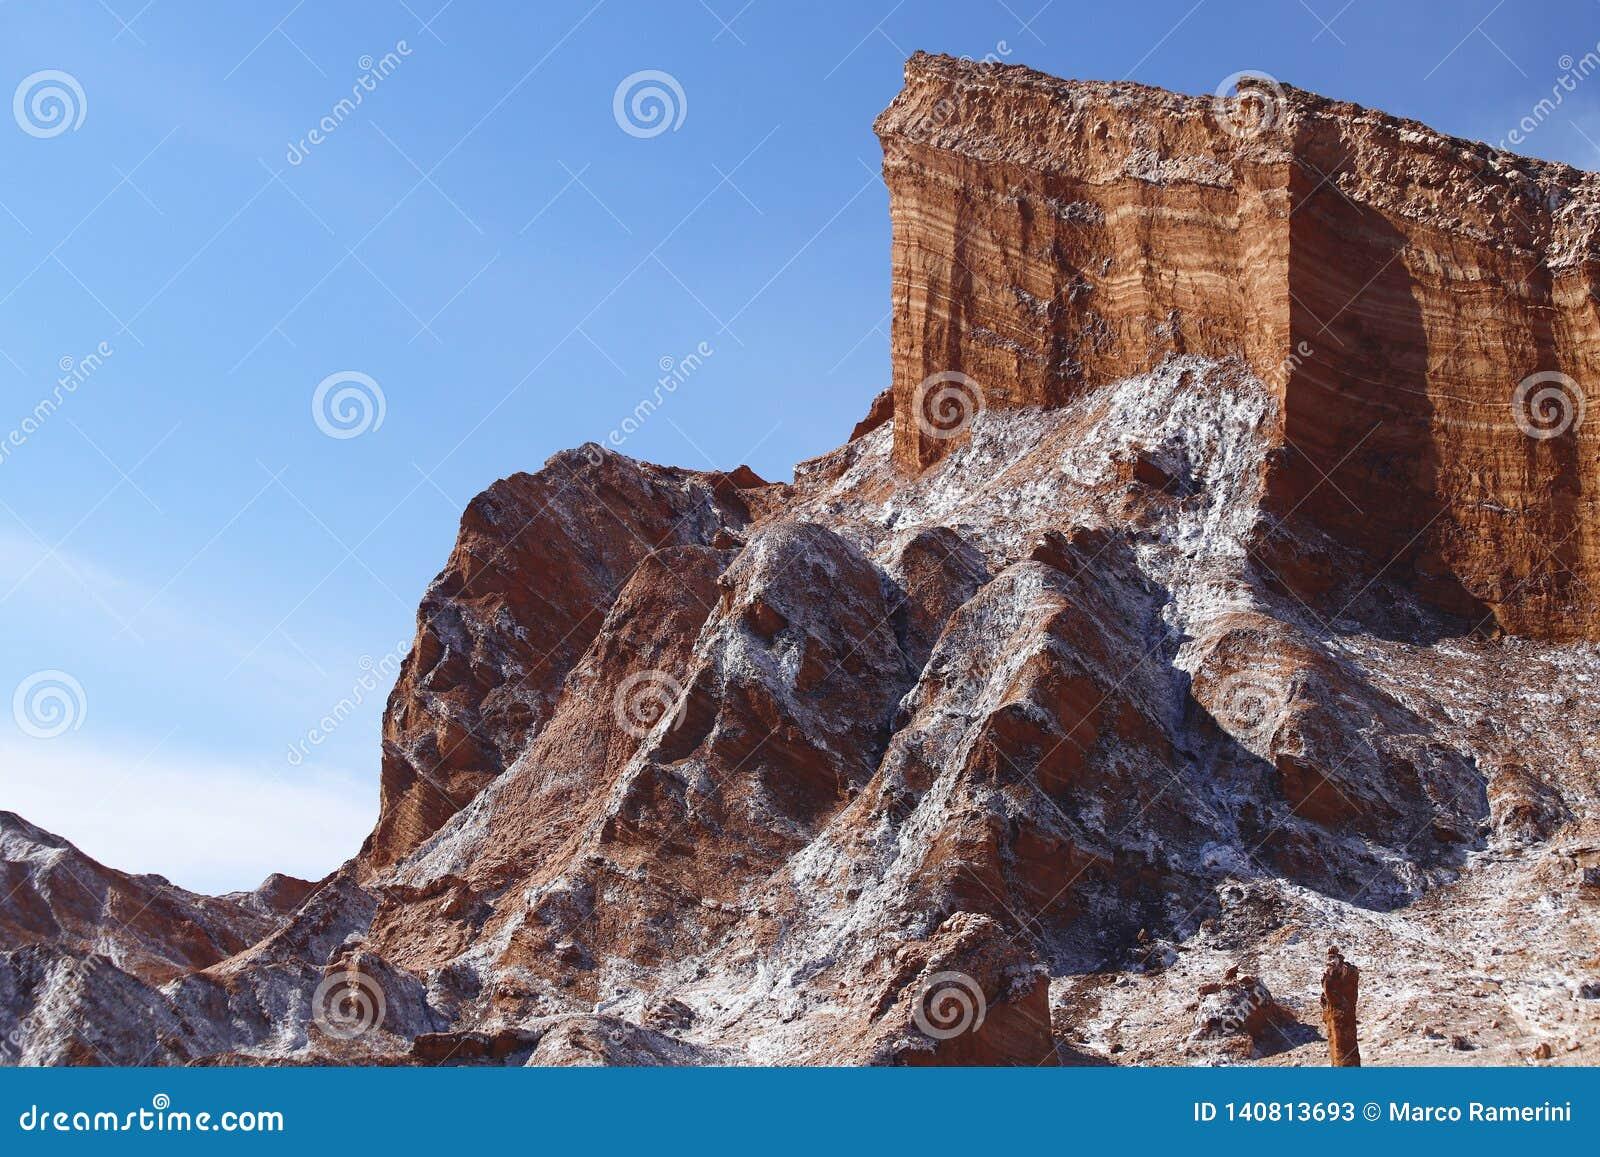 Vale da lua - la Luna de Valle de, deserto de Atacama, o Chile